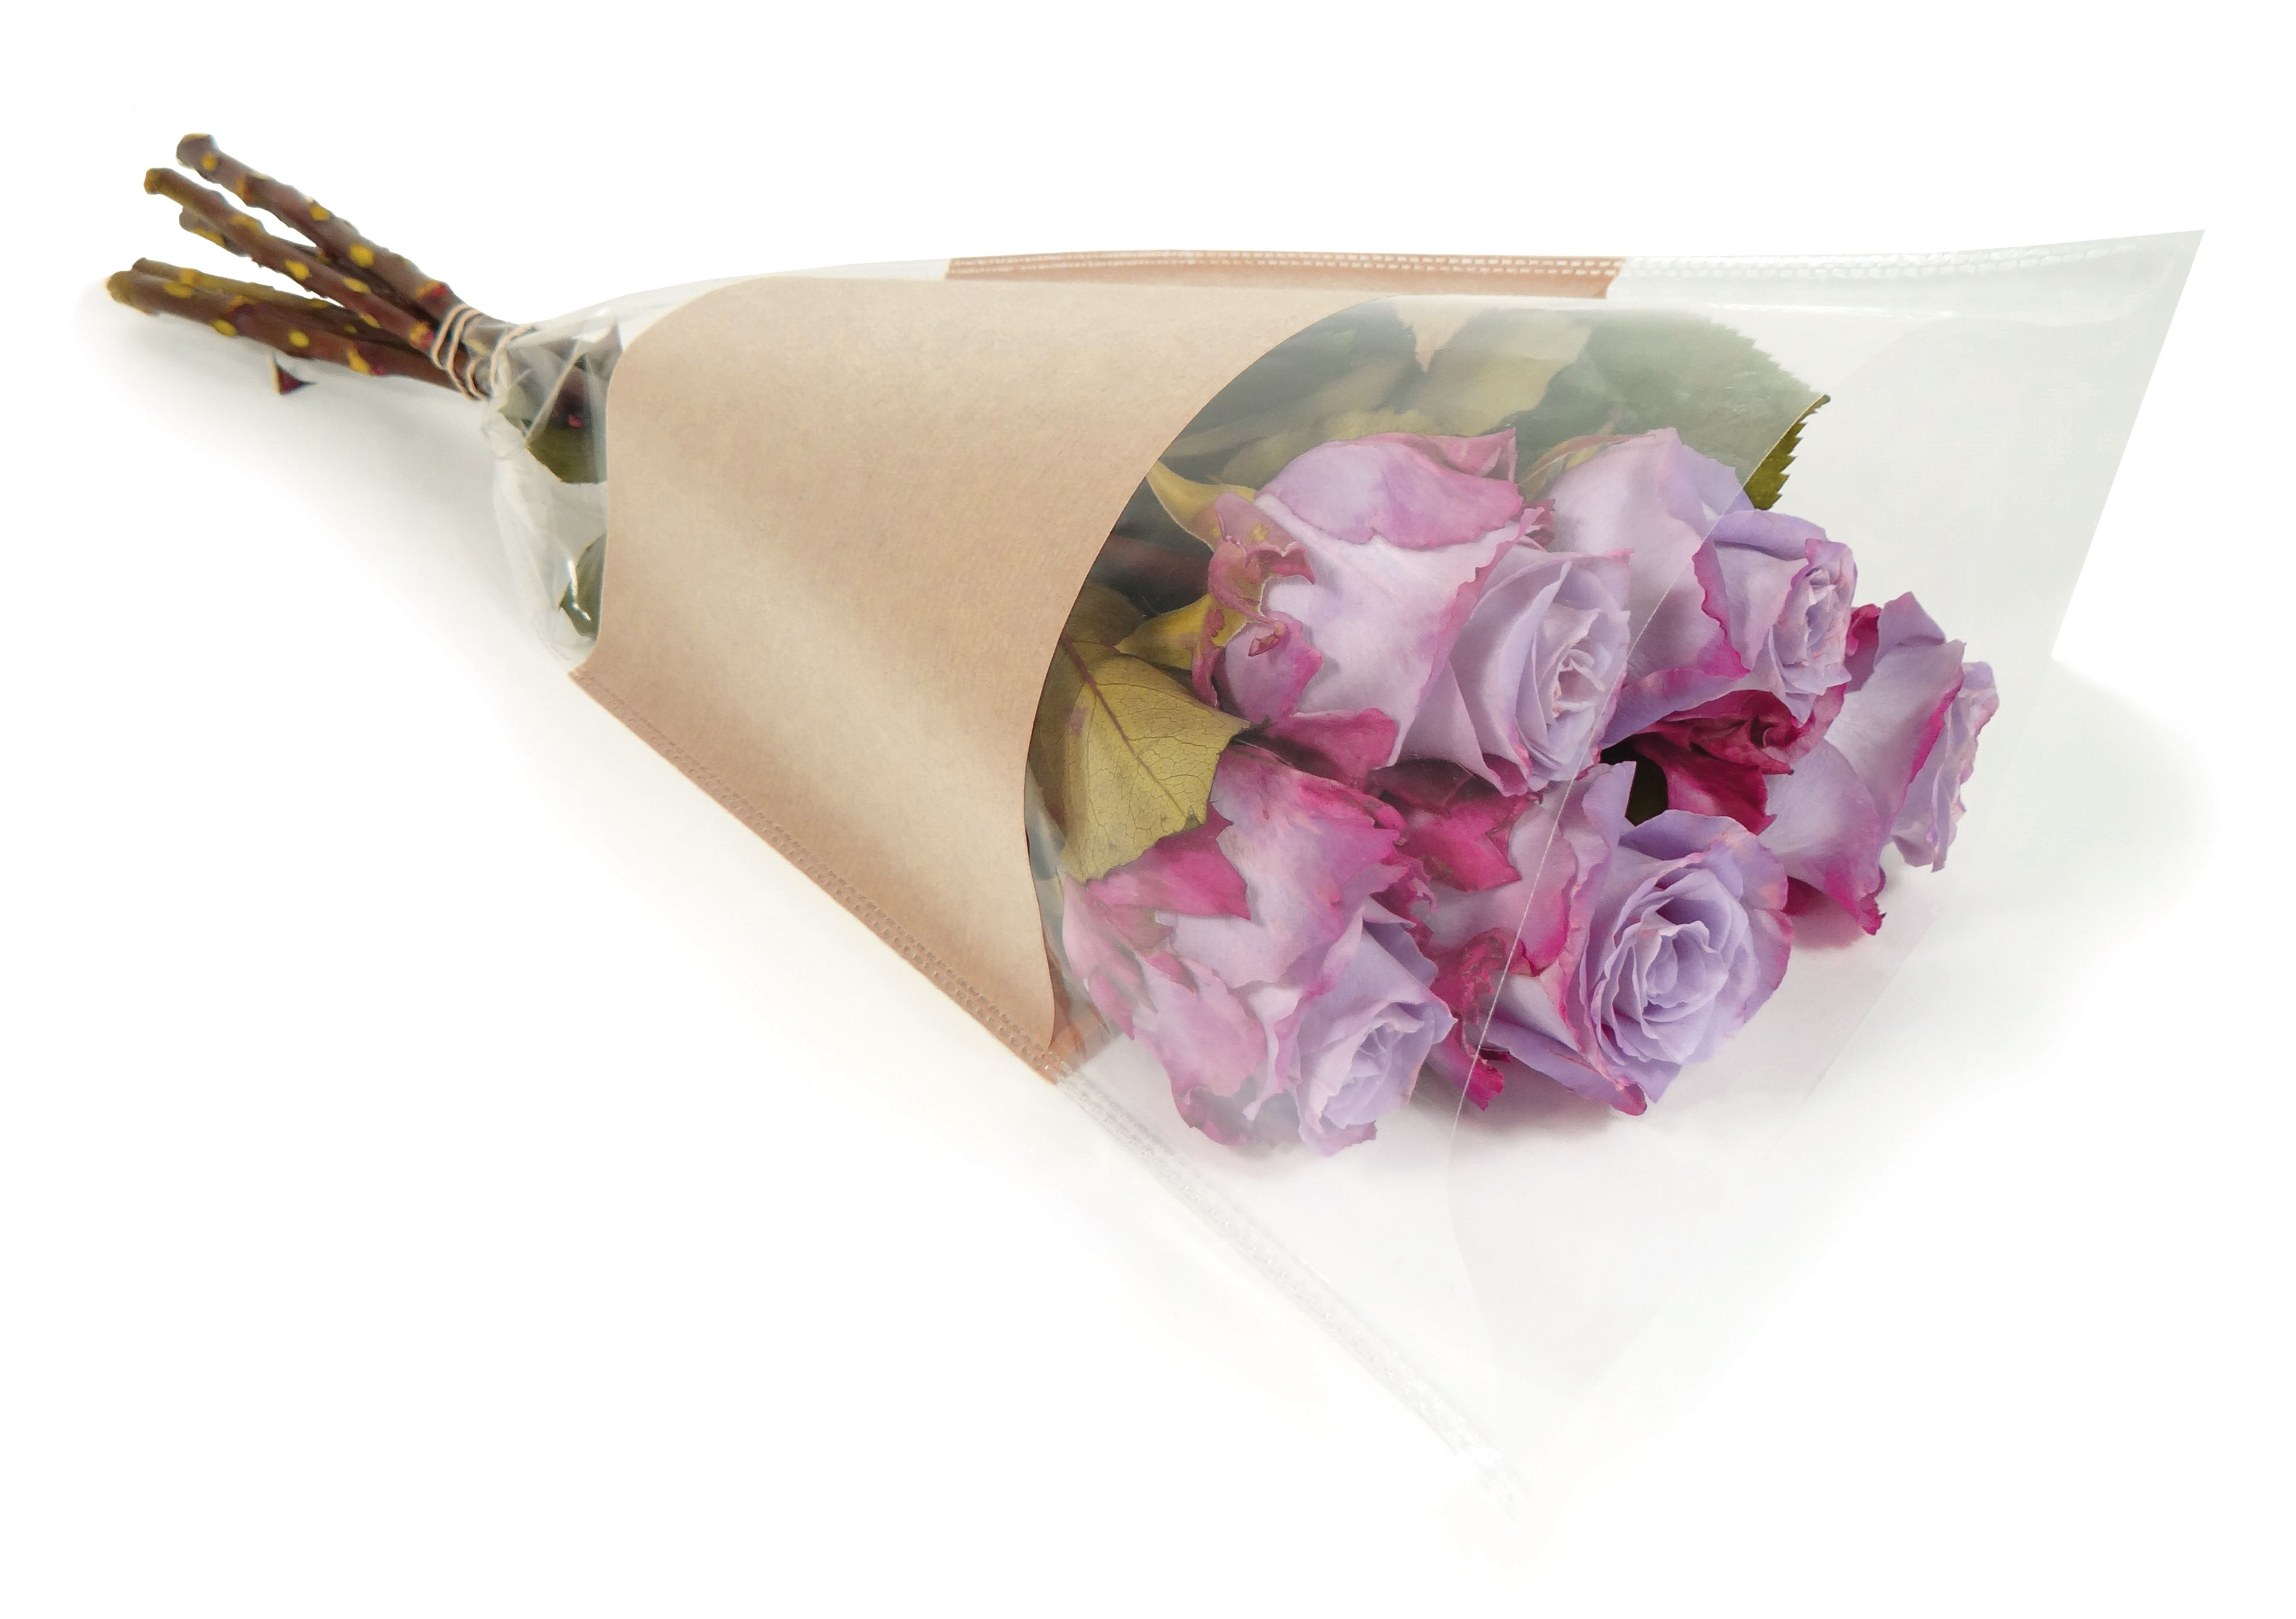 Nature Line sleeves | Natural kraft paper & BOPP | Available sizes: 40x30x12cm, 50x35x10cm, 50x44x12cm, 60x40x15cm, 70x60x15cm, 75x16x8cm